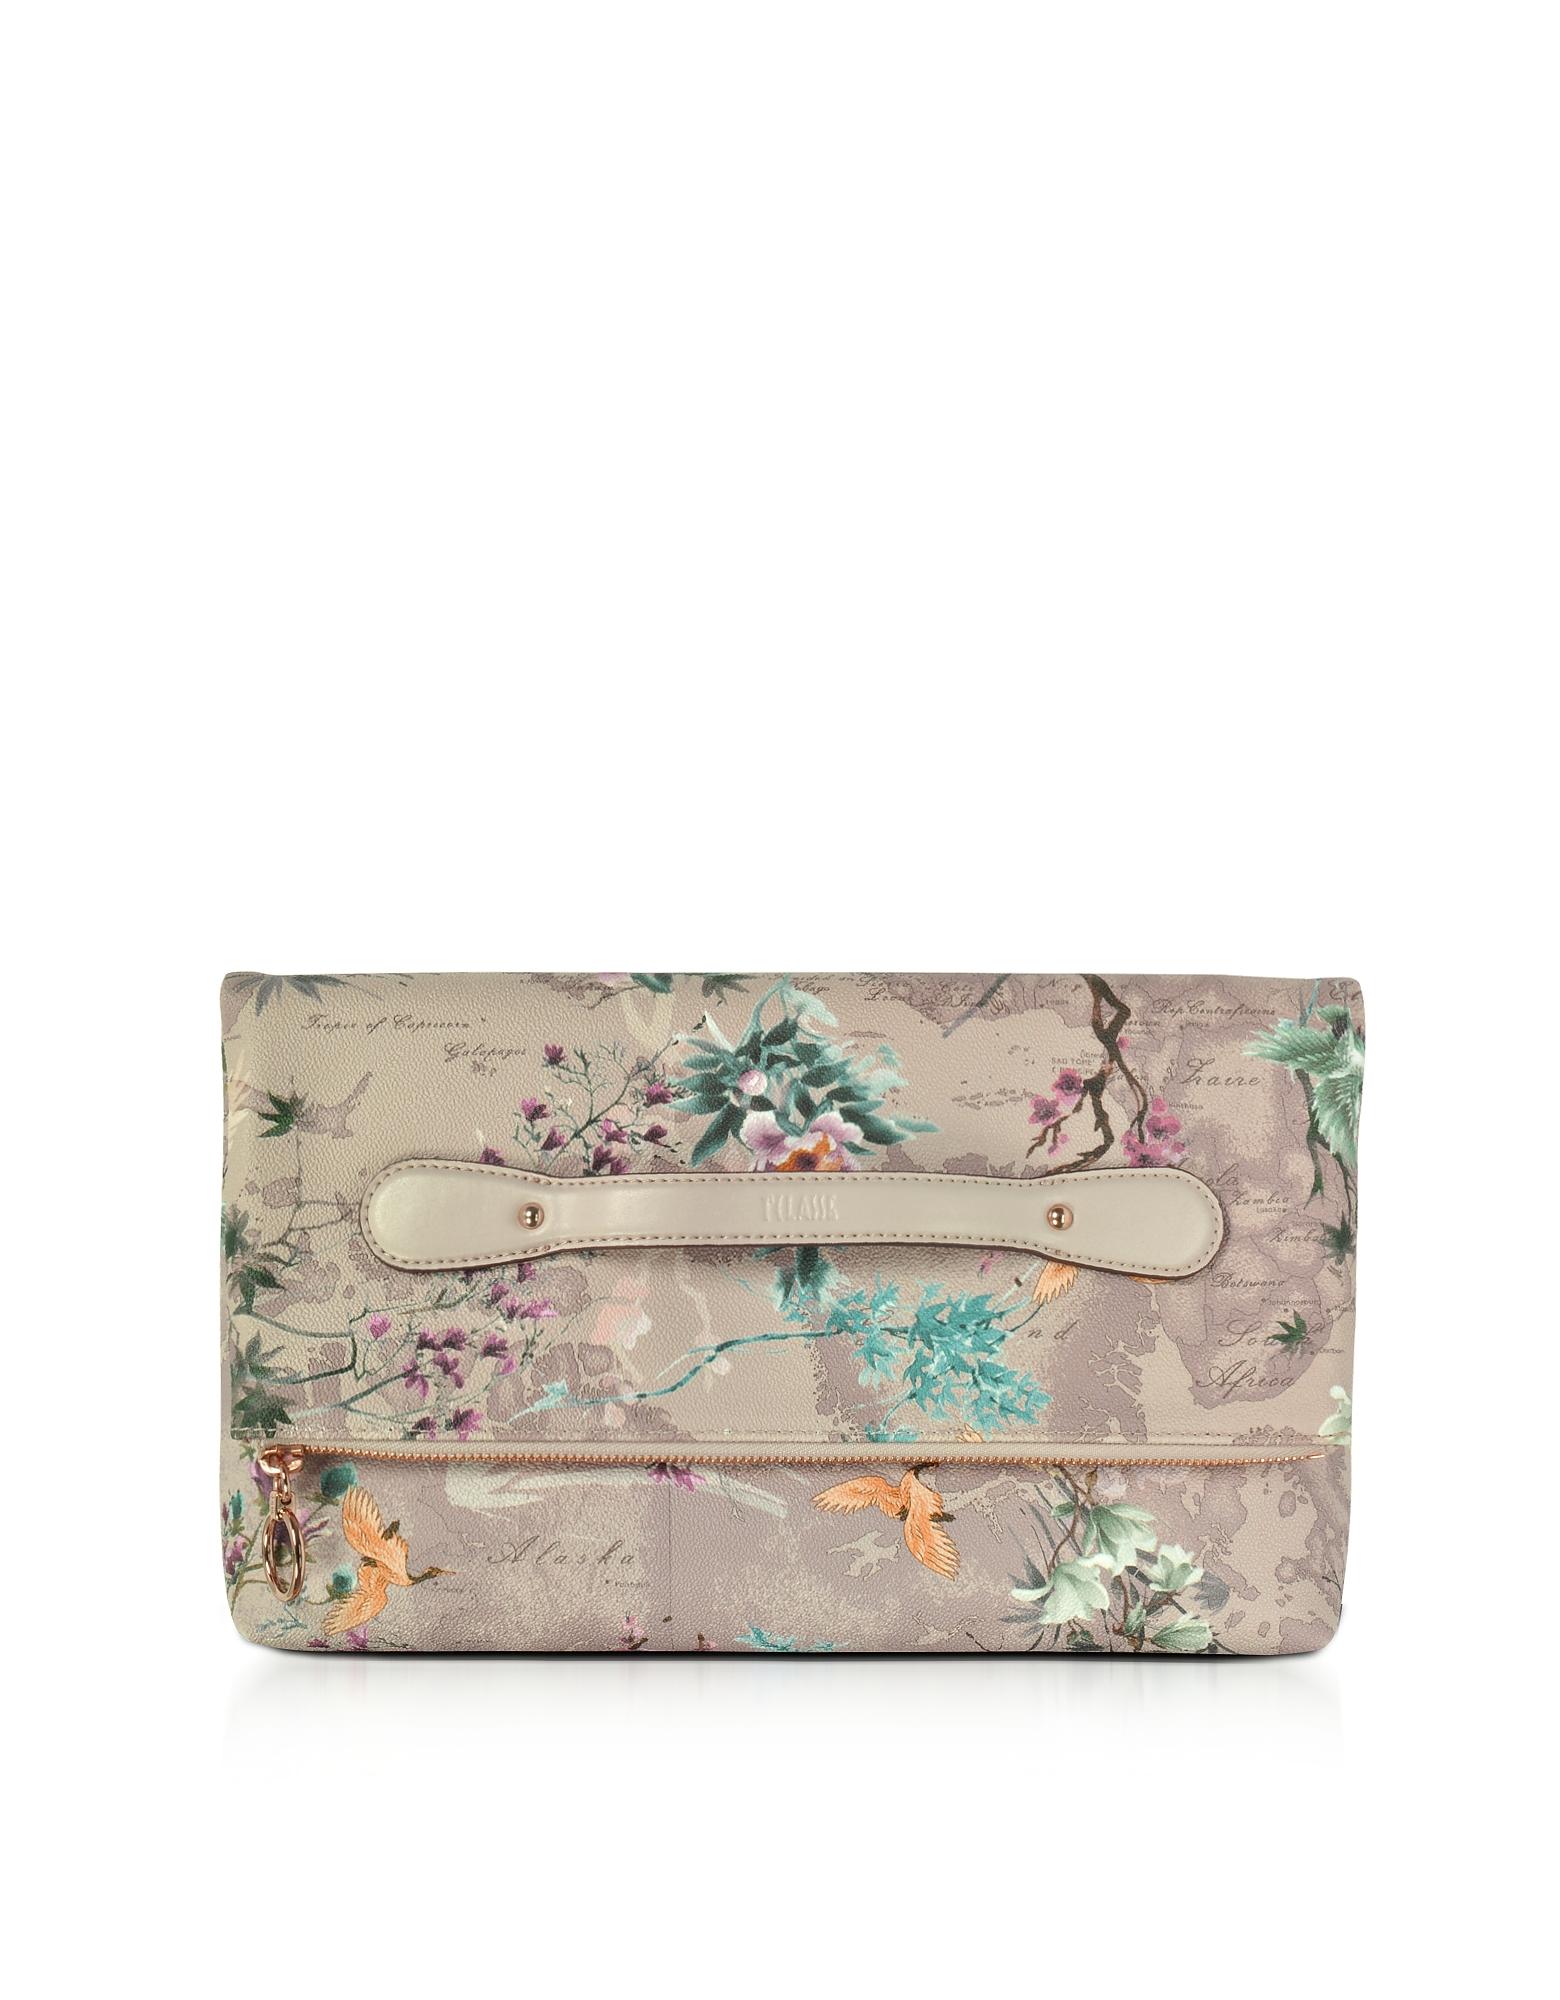 Alviero Martini 1A Classe Handbags, Oriental Garden Clutch